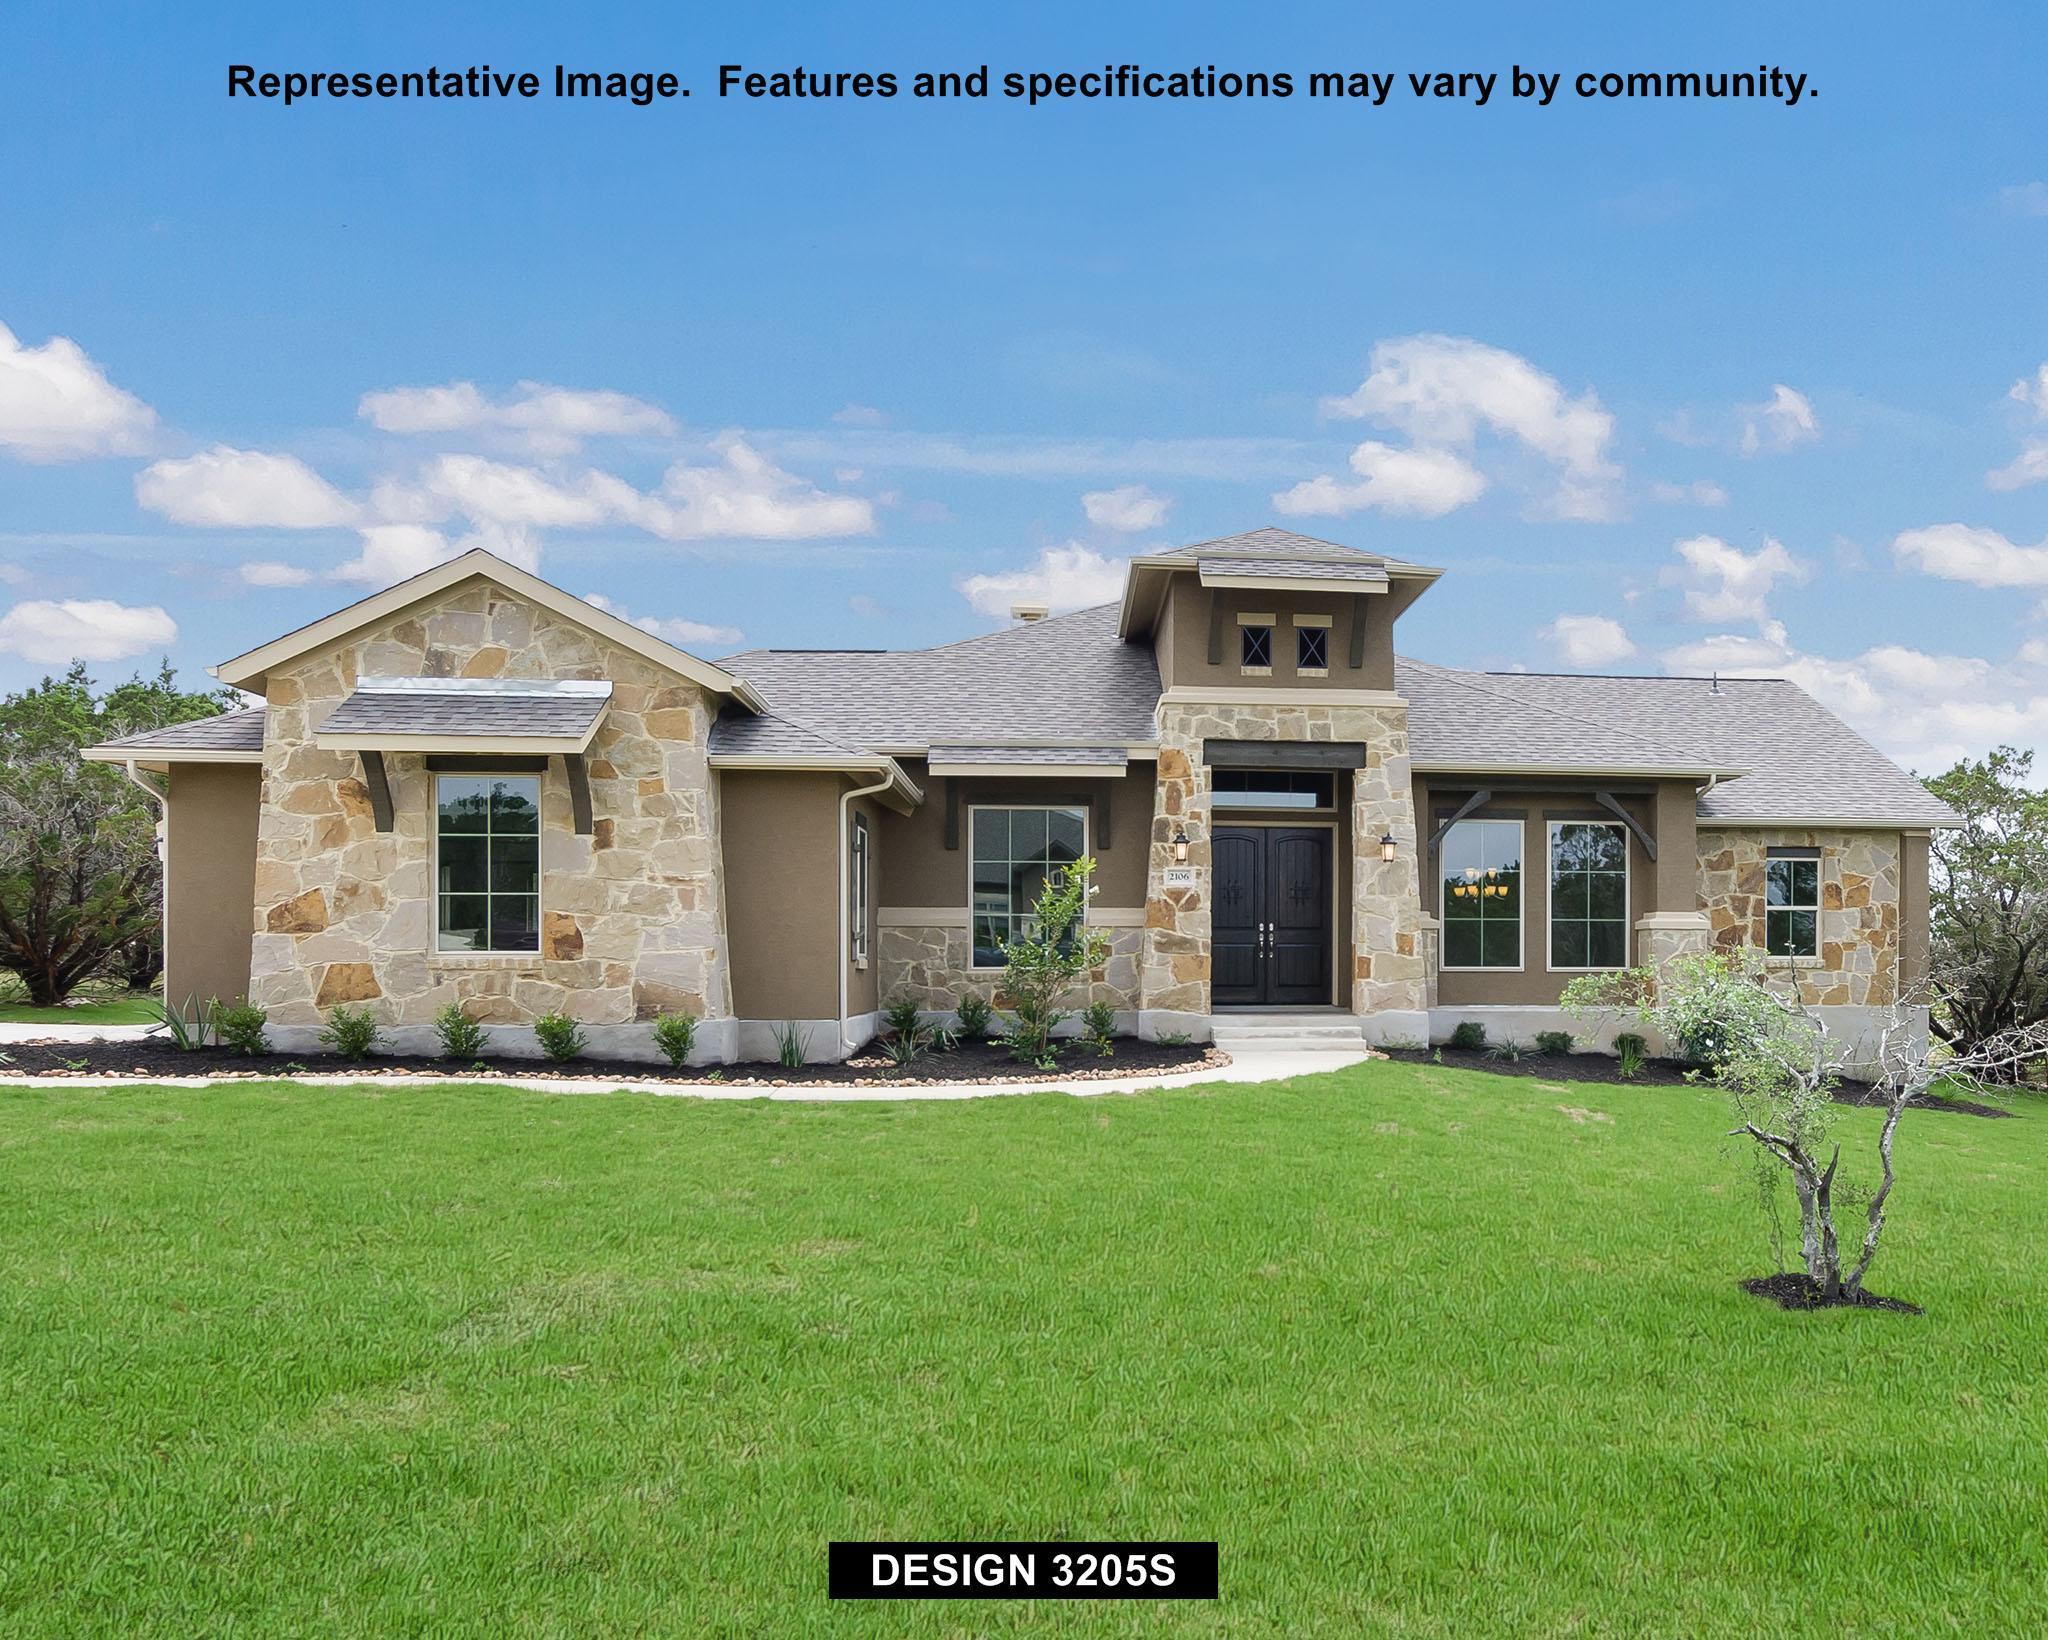 Single Family for Sale at Balcones Creek Half Acre - 3205s 7986 Cibolo View Fair Oaks Ranch, Texas 78015 United States